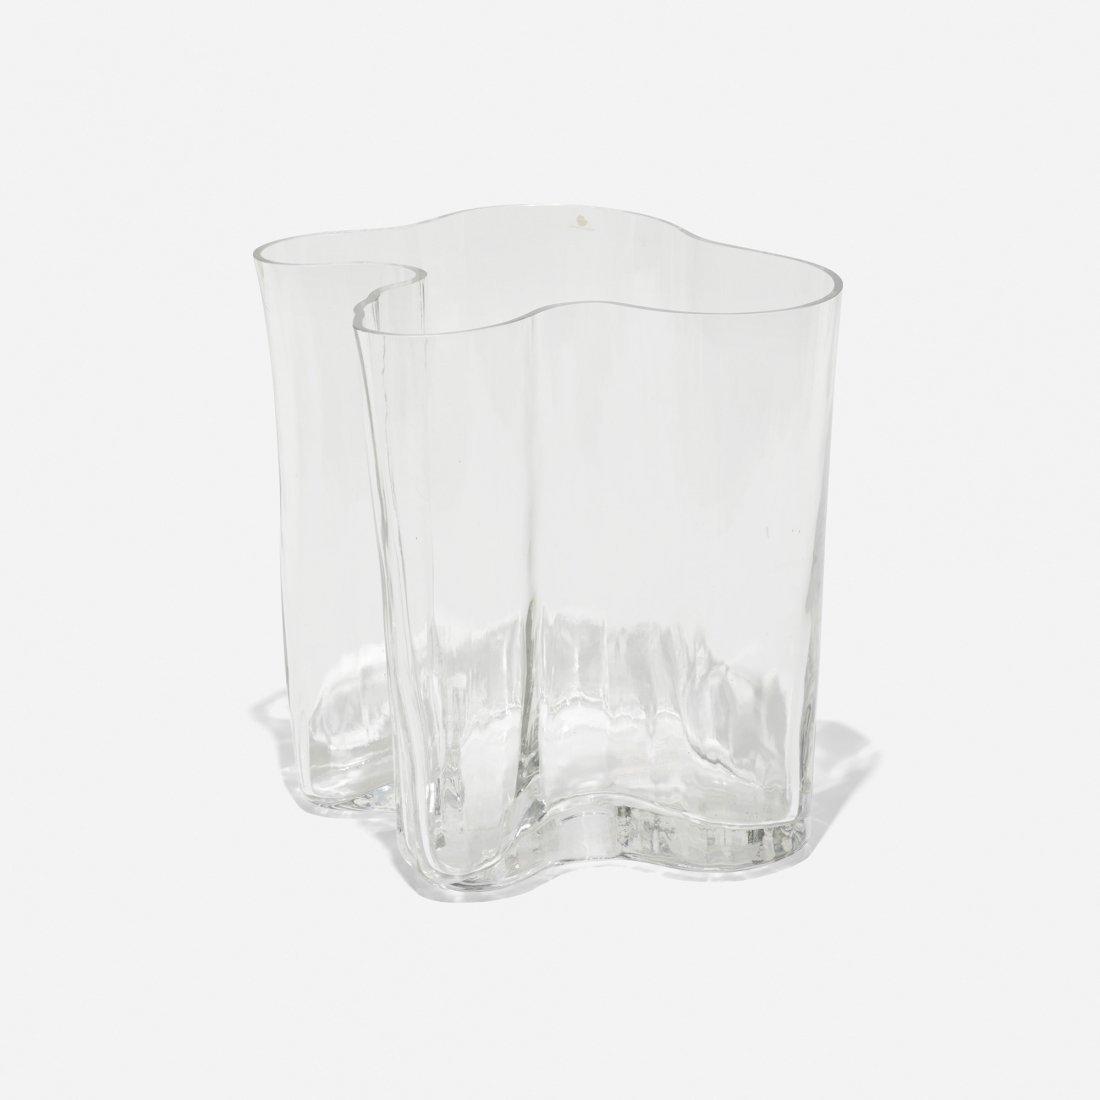 Alvar Aalto Savoy vase